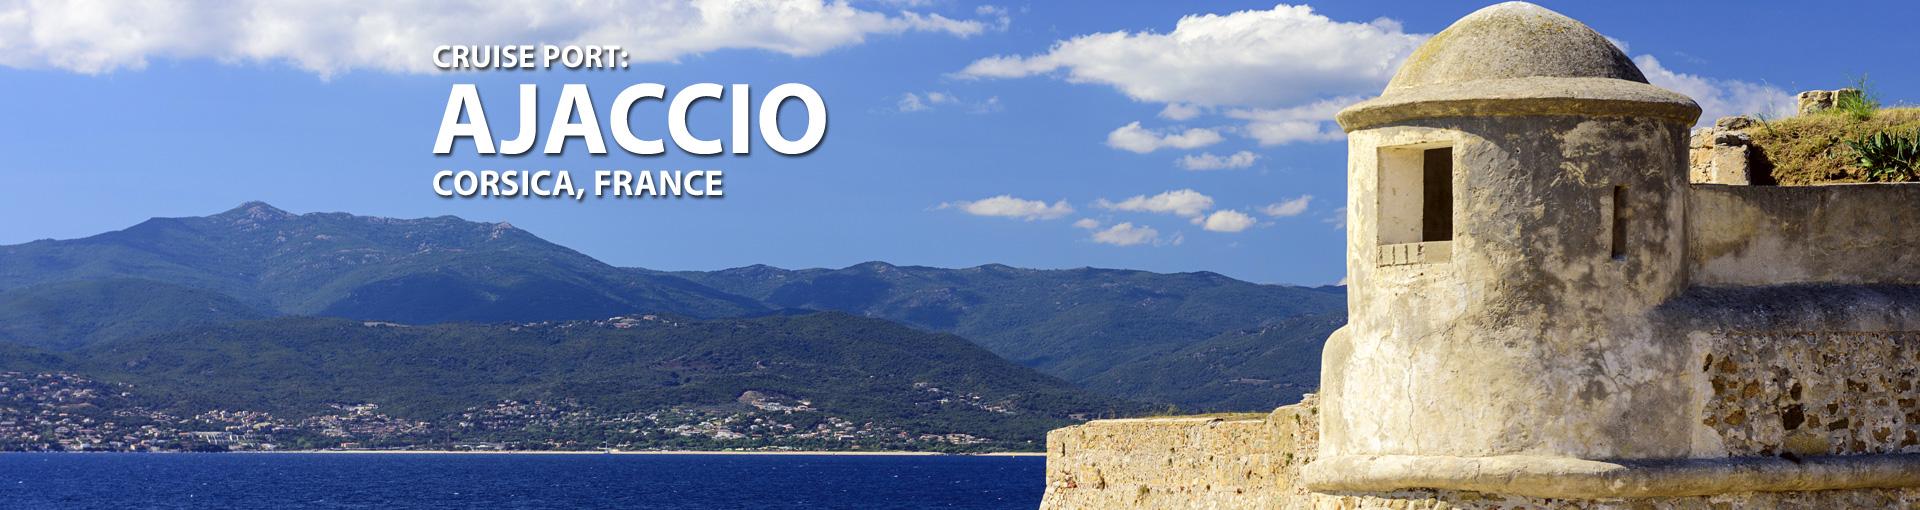 Cruises to Ajaccio, Corsica, France